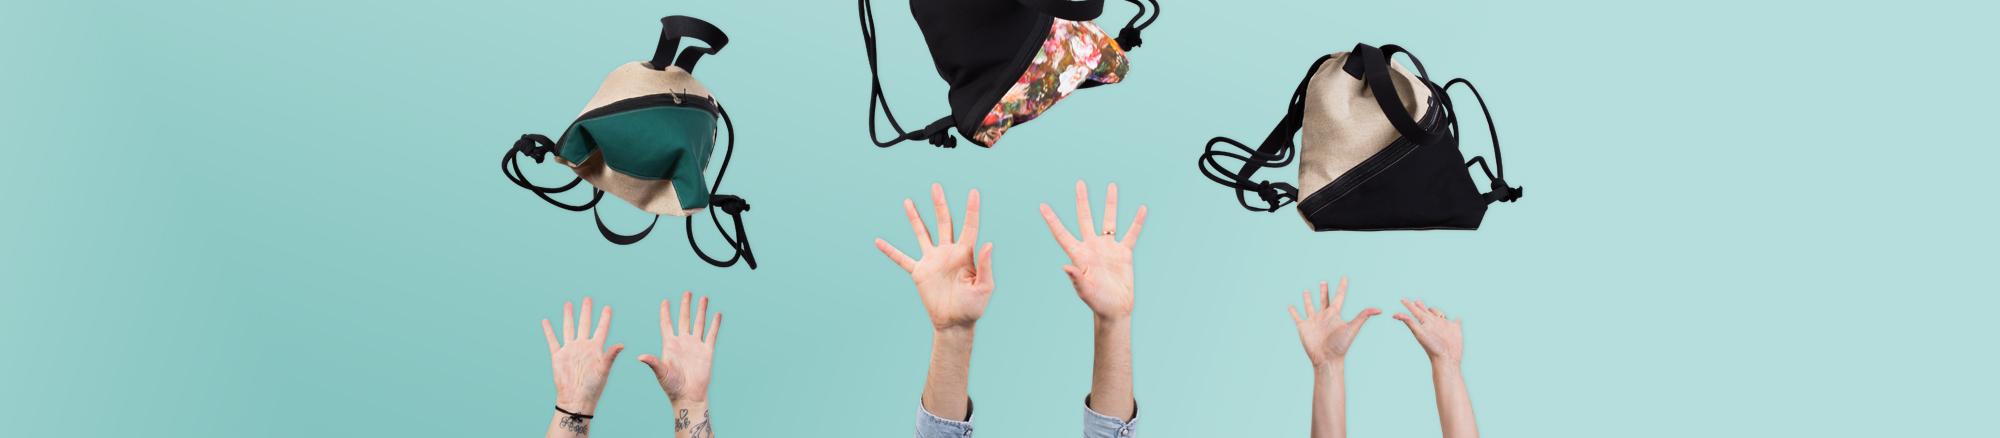 fairer rucksack im turnbeutel stil